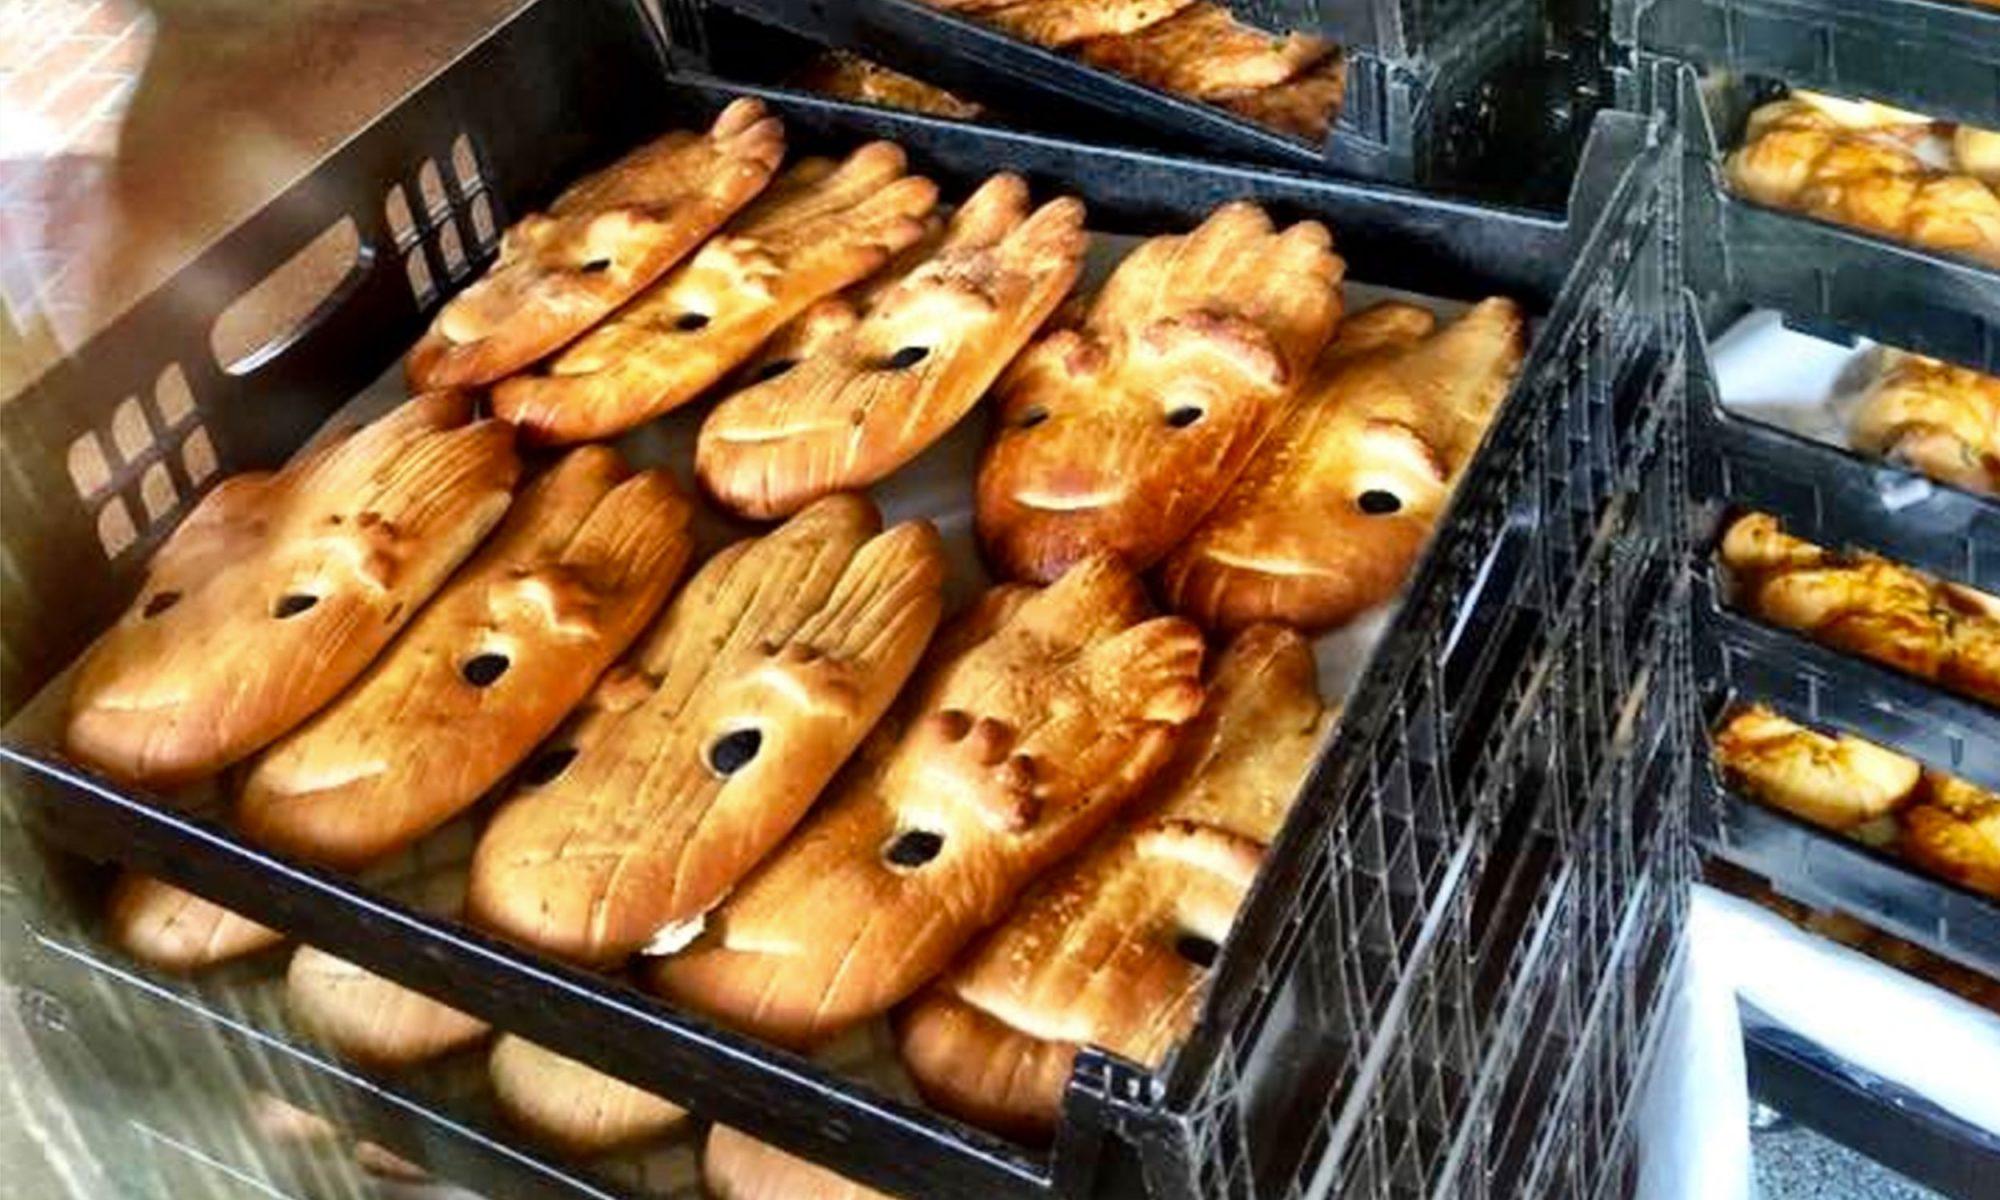 EC: Groot Bread Is the Newest and Cutest Disneyland Food Trend